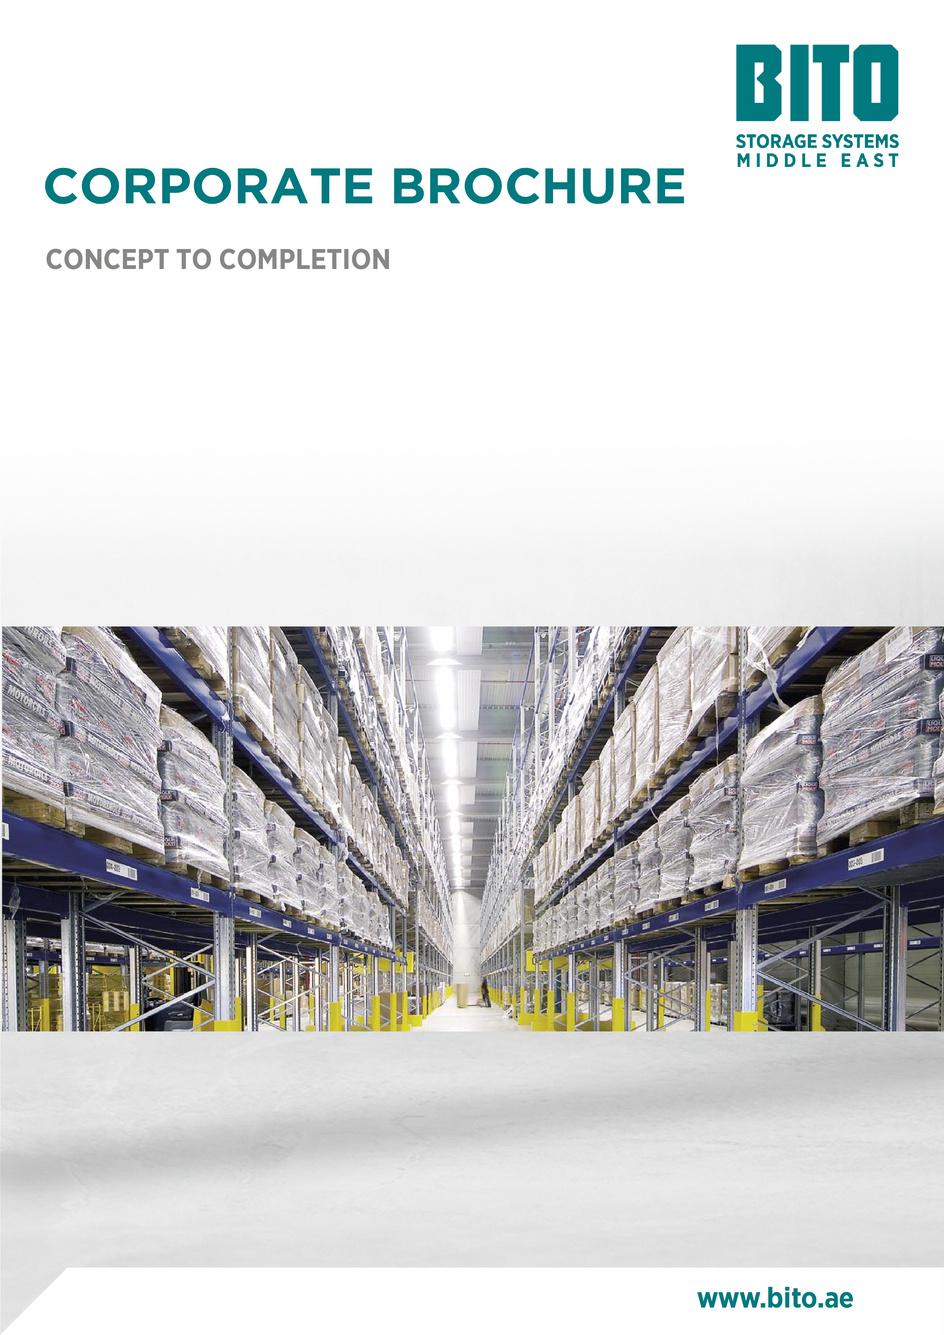 Bito Uae Corporate Brochure